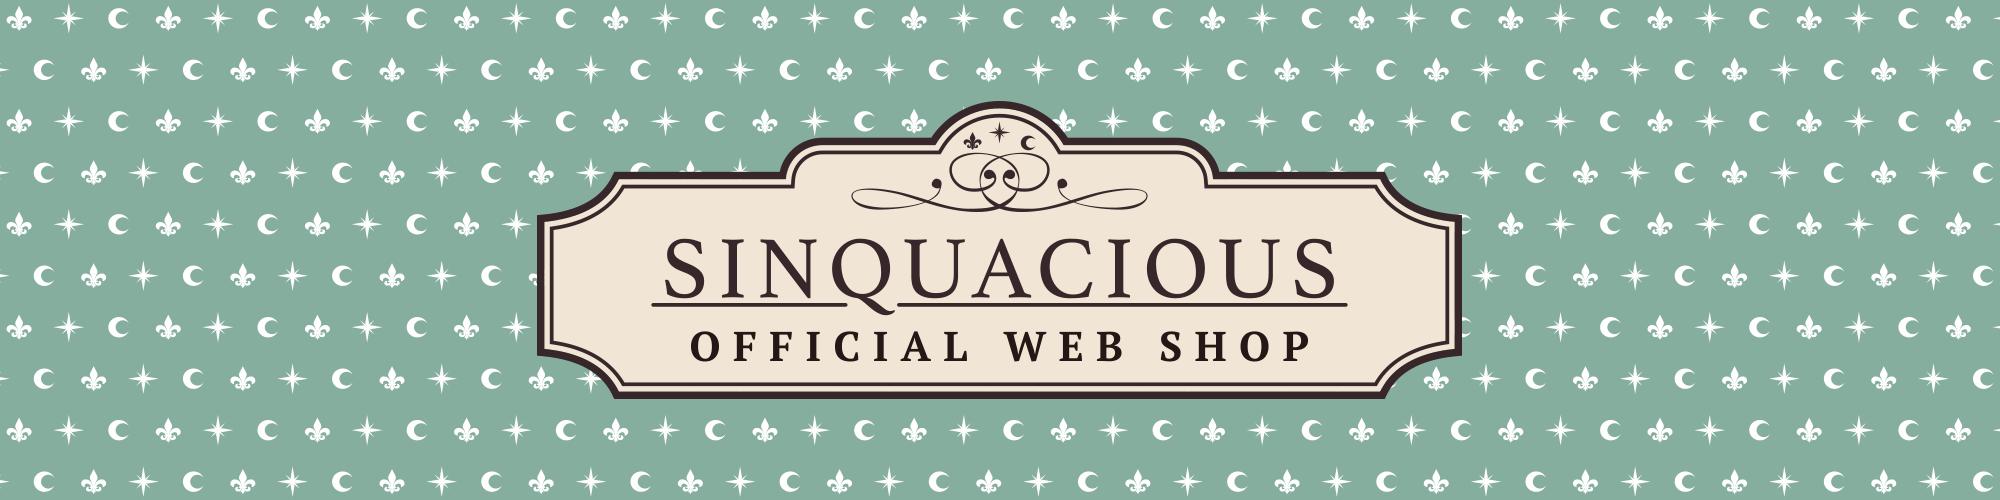 Sinquacious Official Web Shop